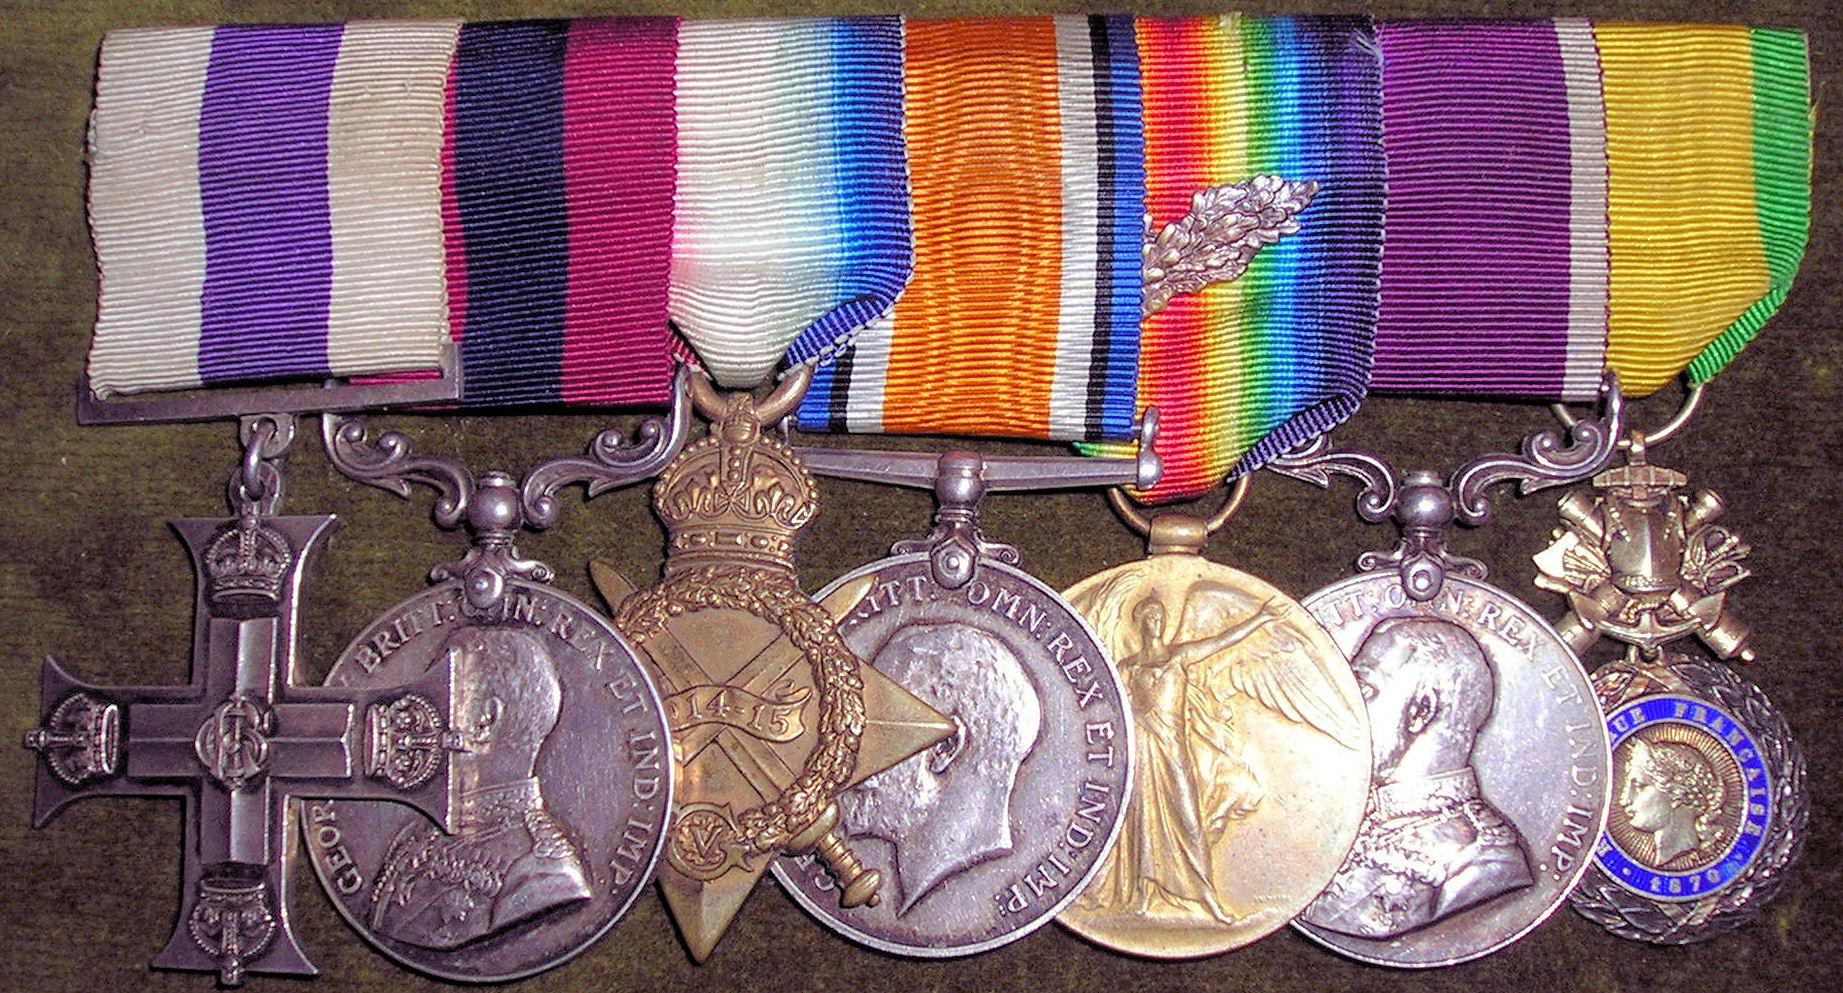 Wakefield / outwood Medal & Militaria Fair